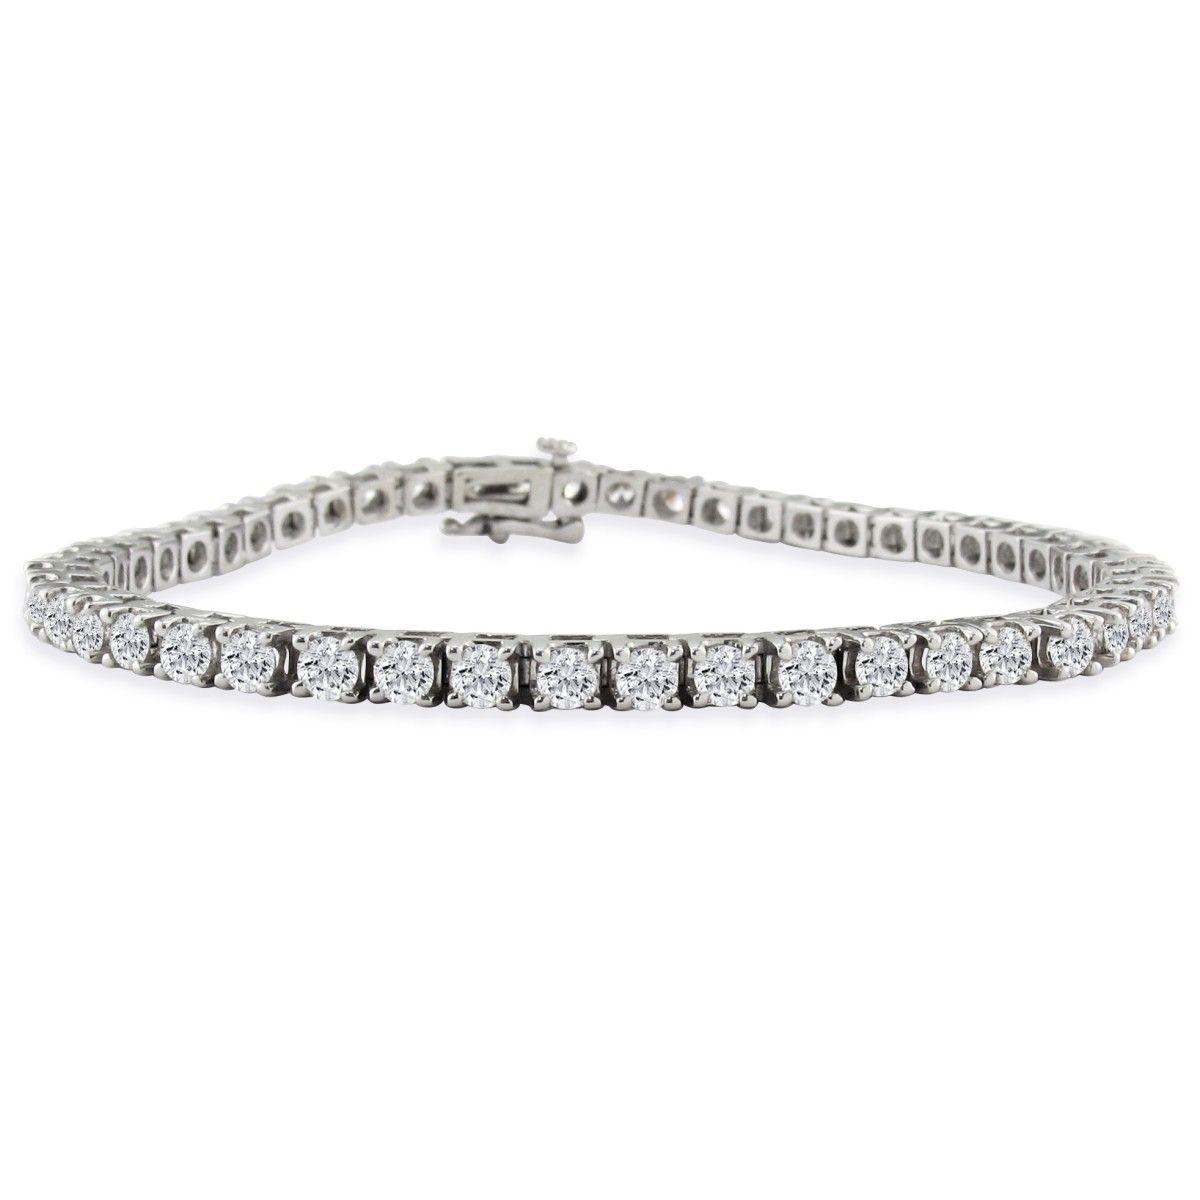 73391b06753 7 Inch 14K White Gold 5 Carat Diamond Tennis Bracelet